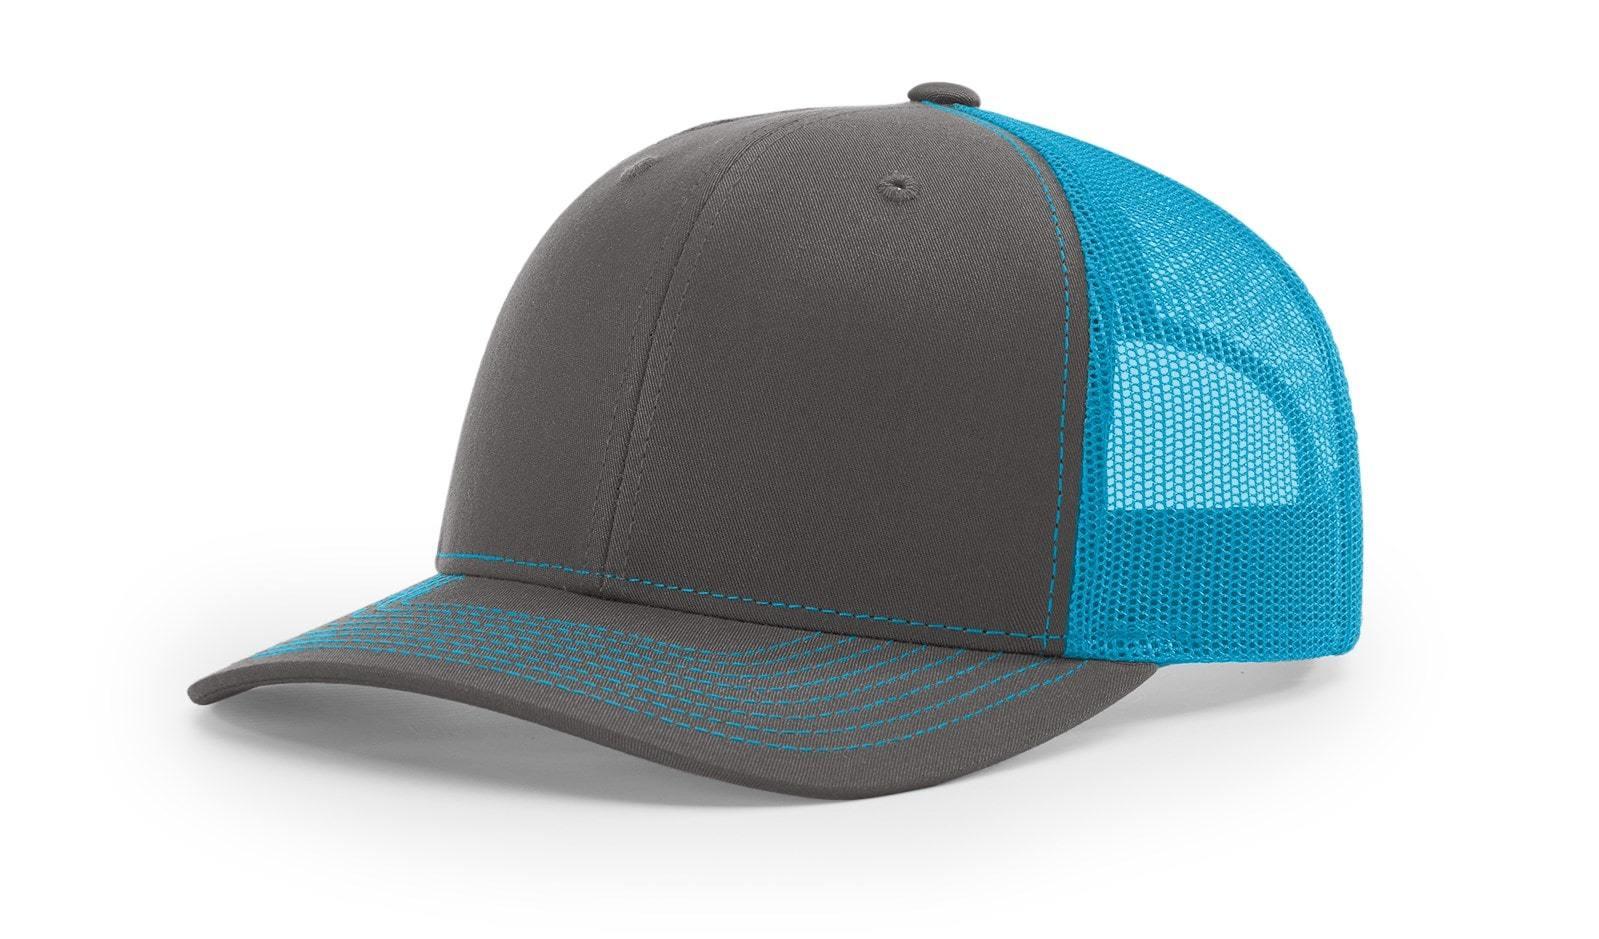 5c0791aef85 Flexfit Snapback Caps – Premium Hats from the Hat Pros